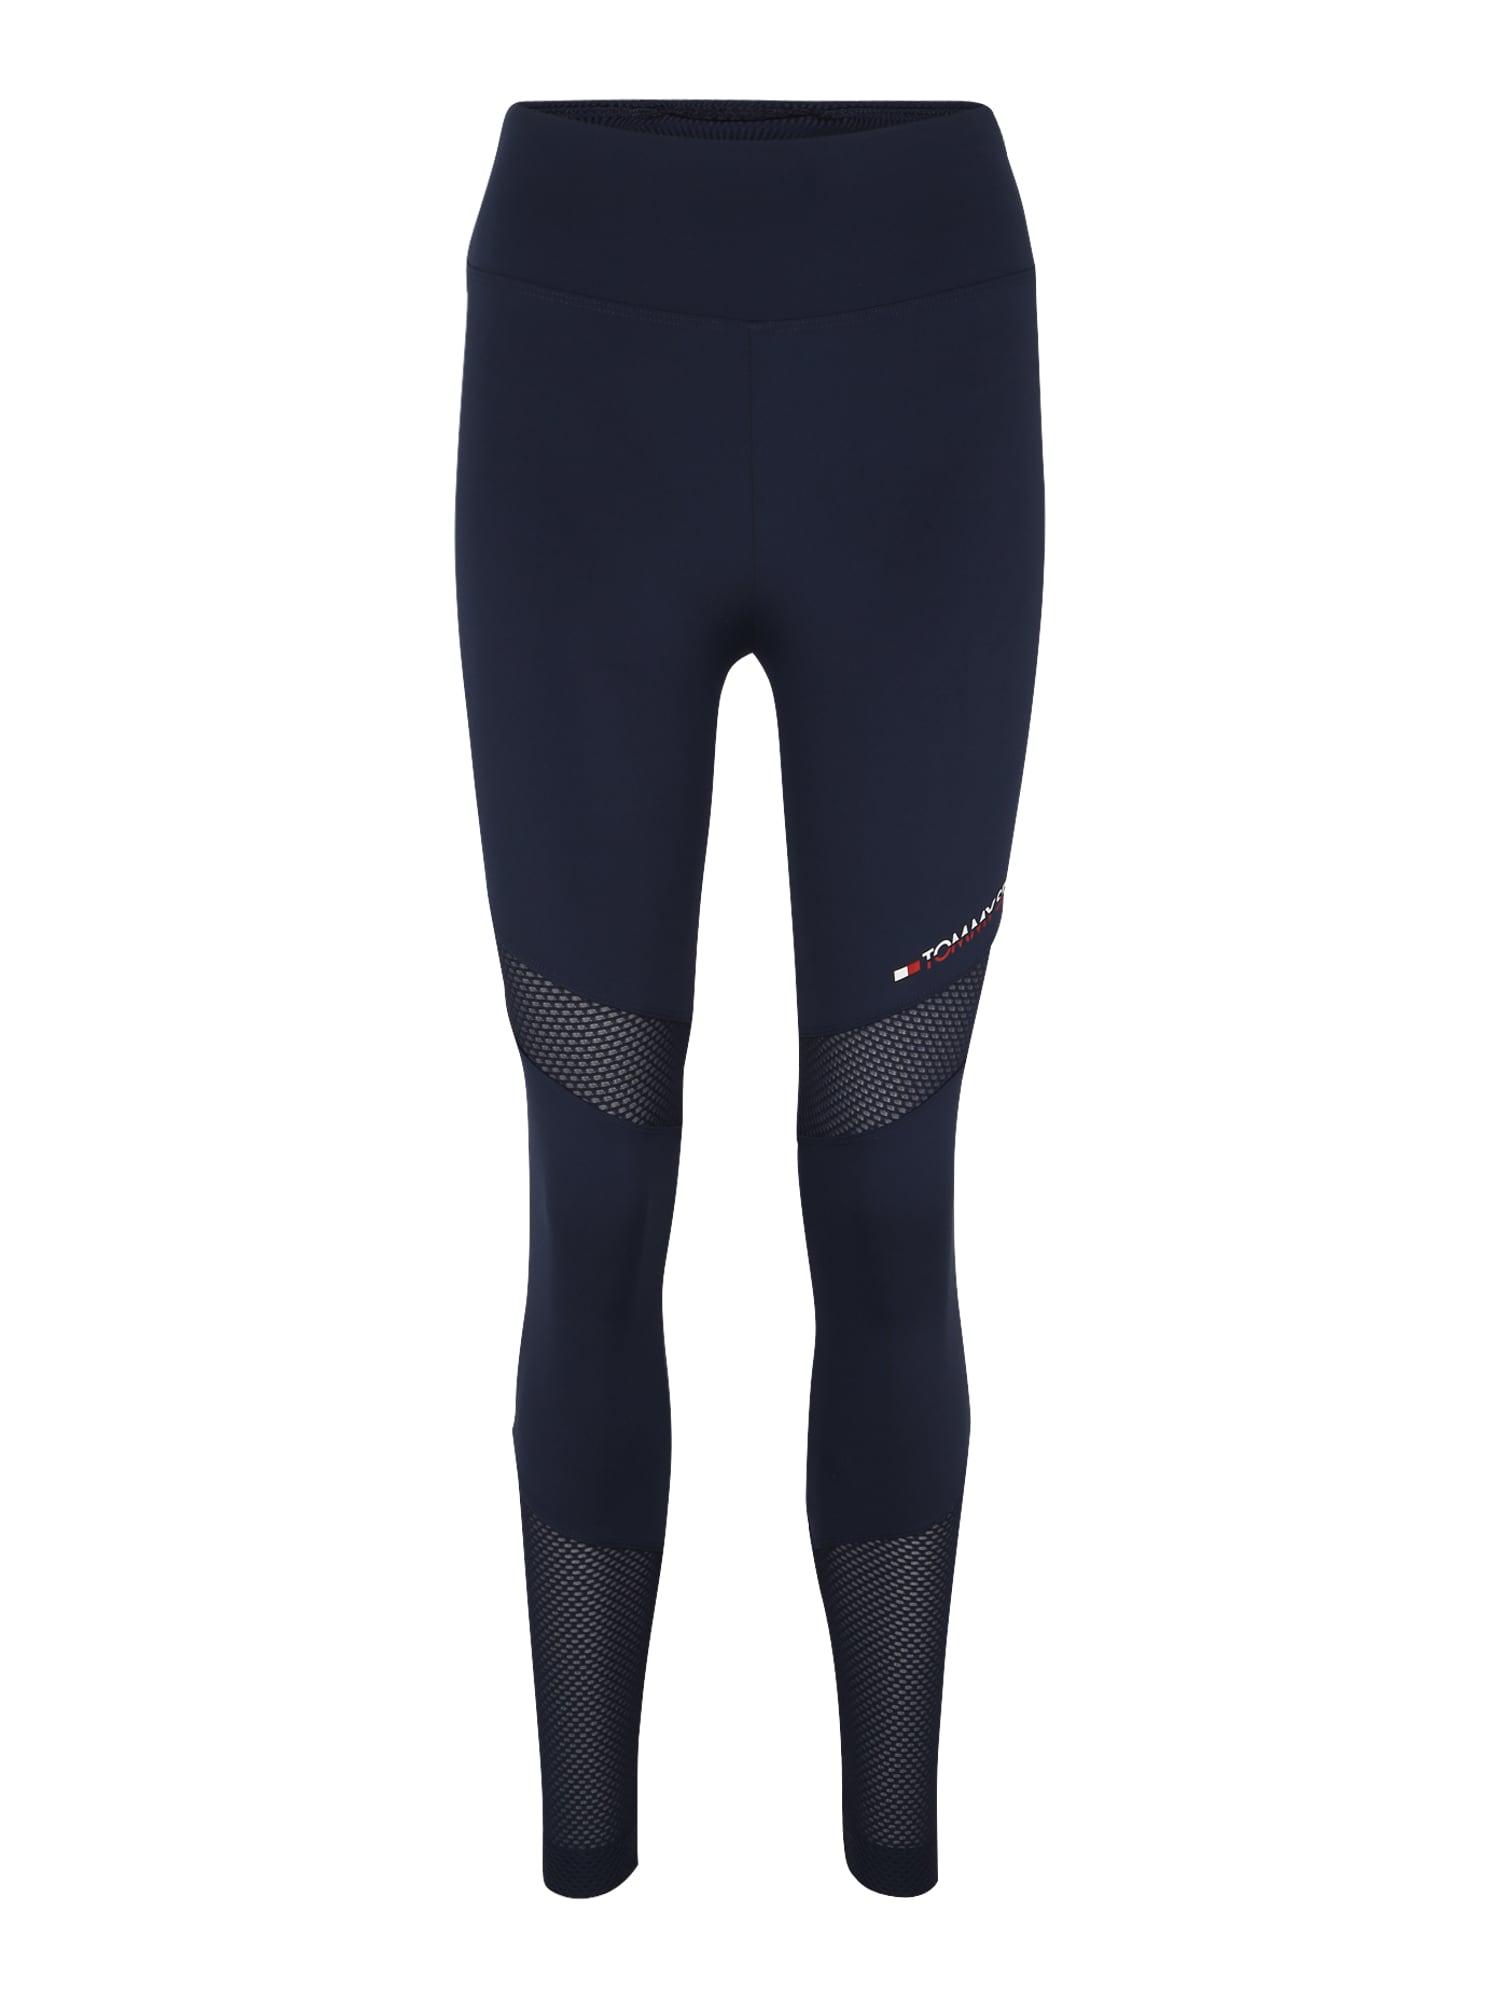 Sportovní kalhoty BLOCKED LEGGING FULL marine modrá Tommy Sport